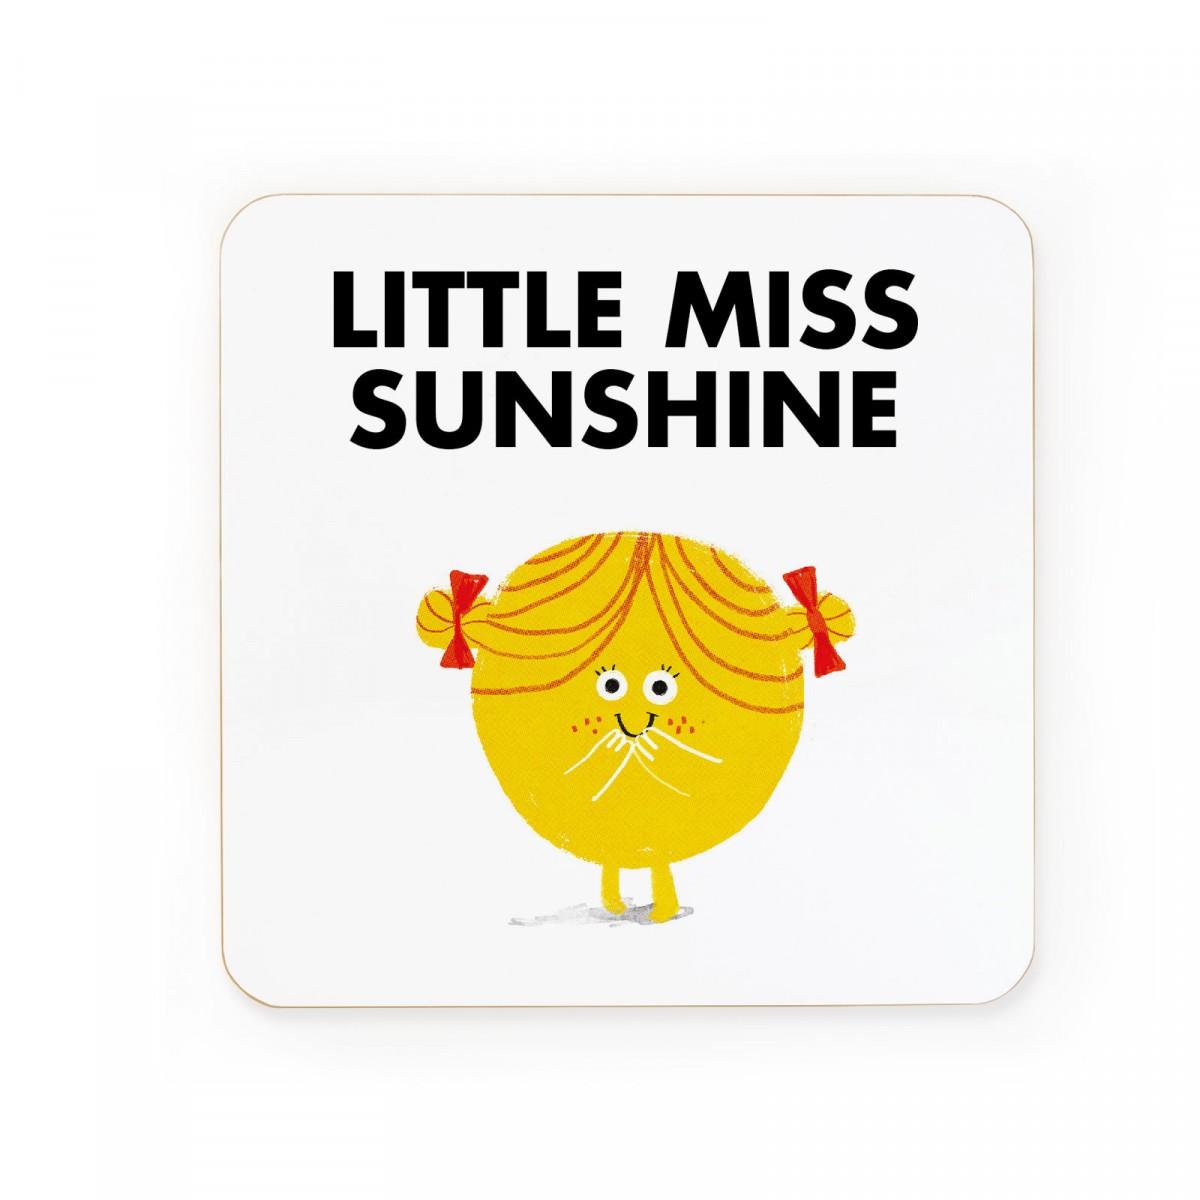 mmlm-co-009_little_miss_sunshine_coaster.jpg